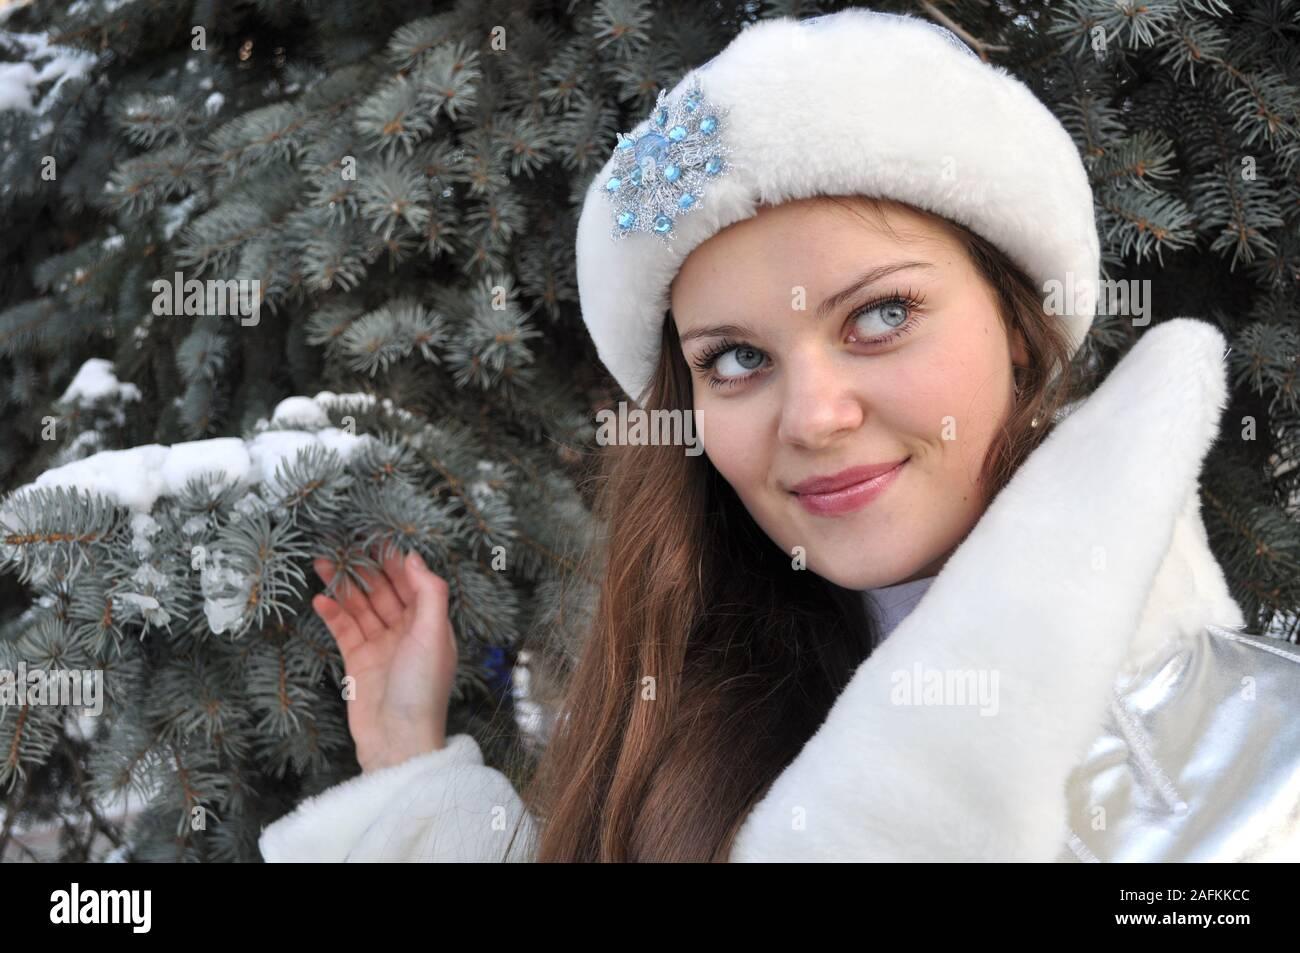 Fkk ukraine